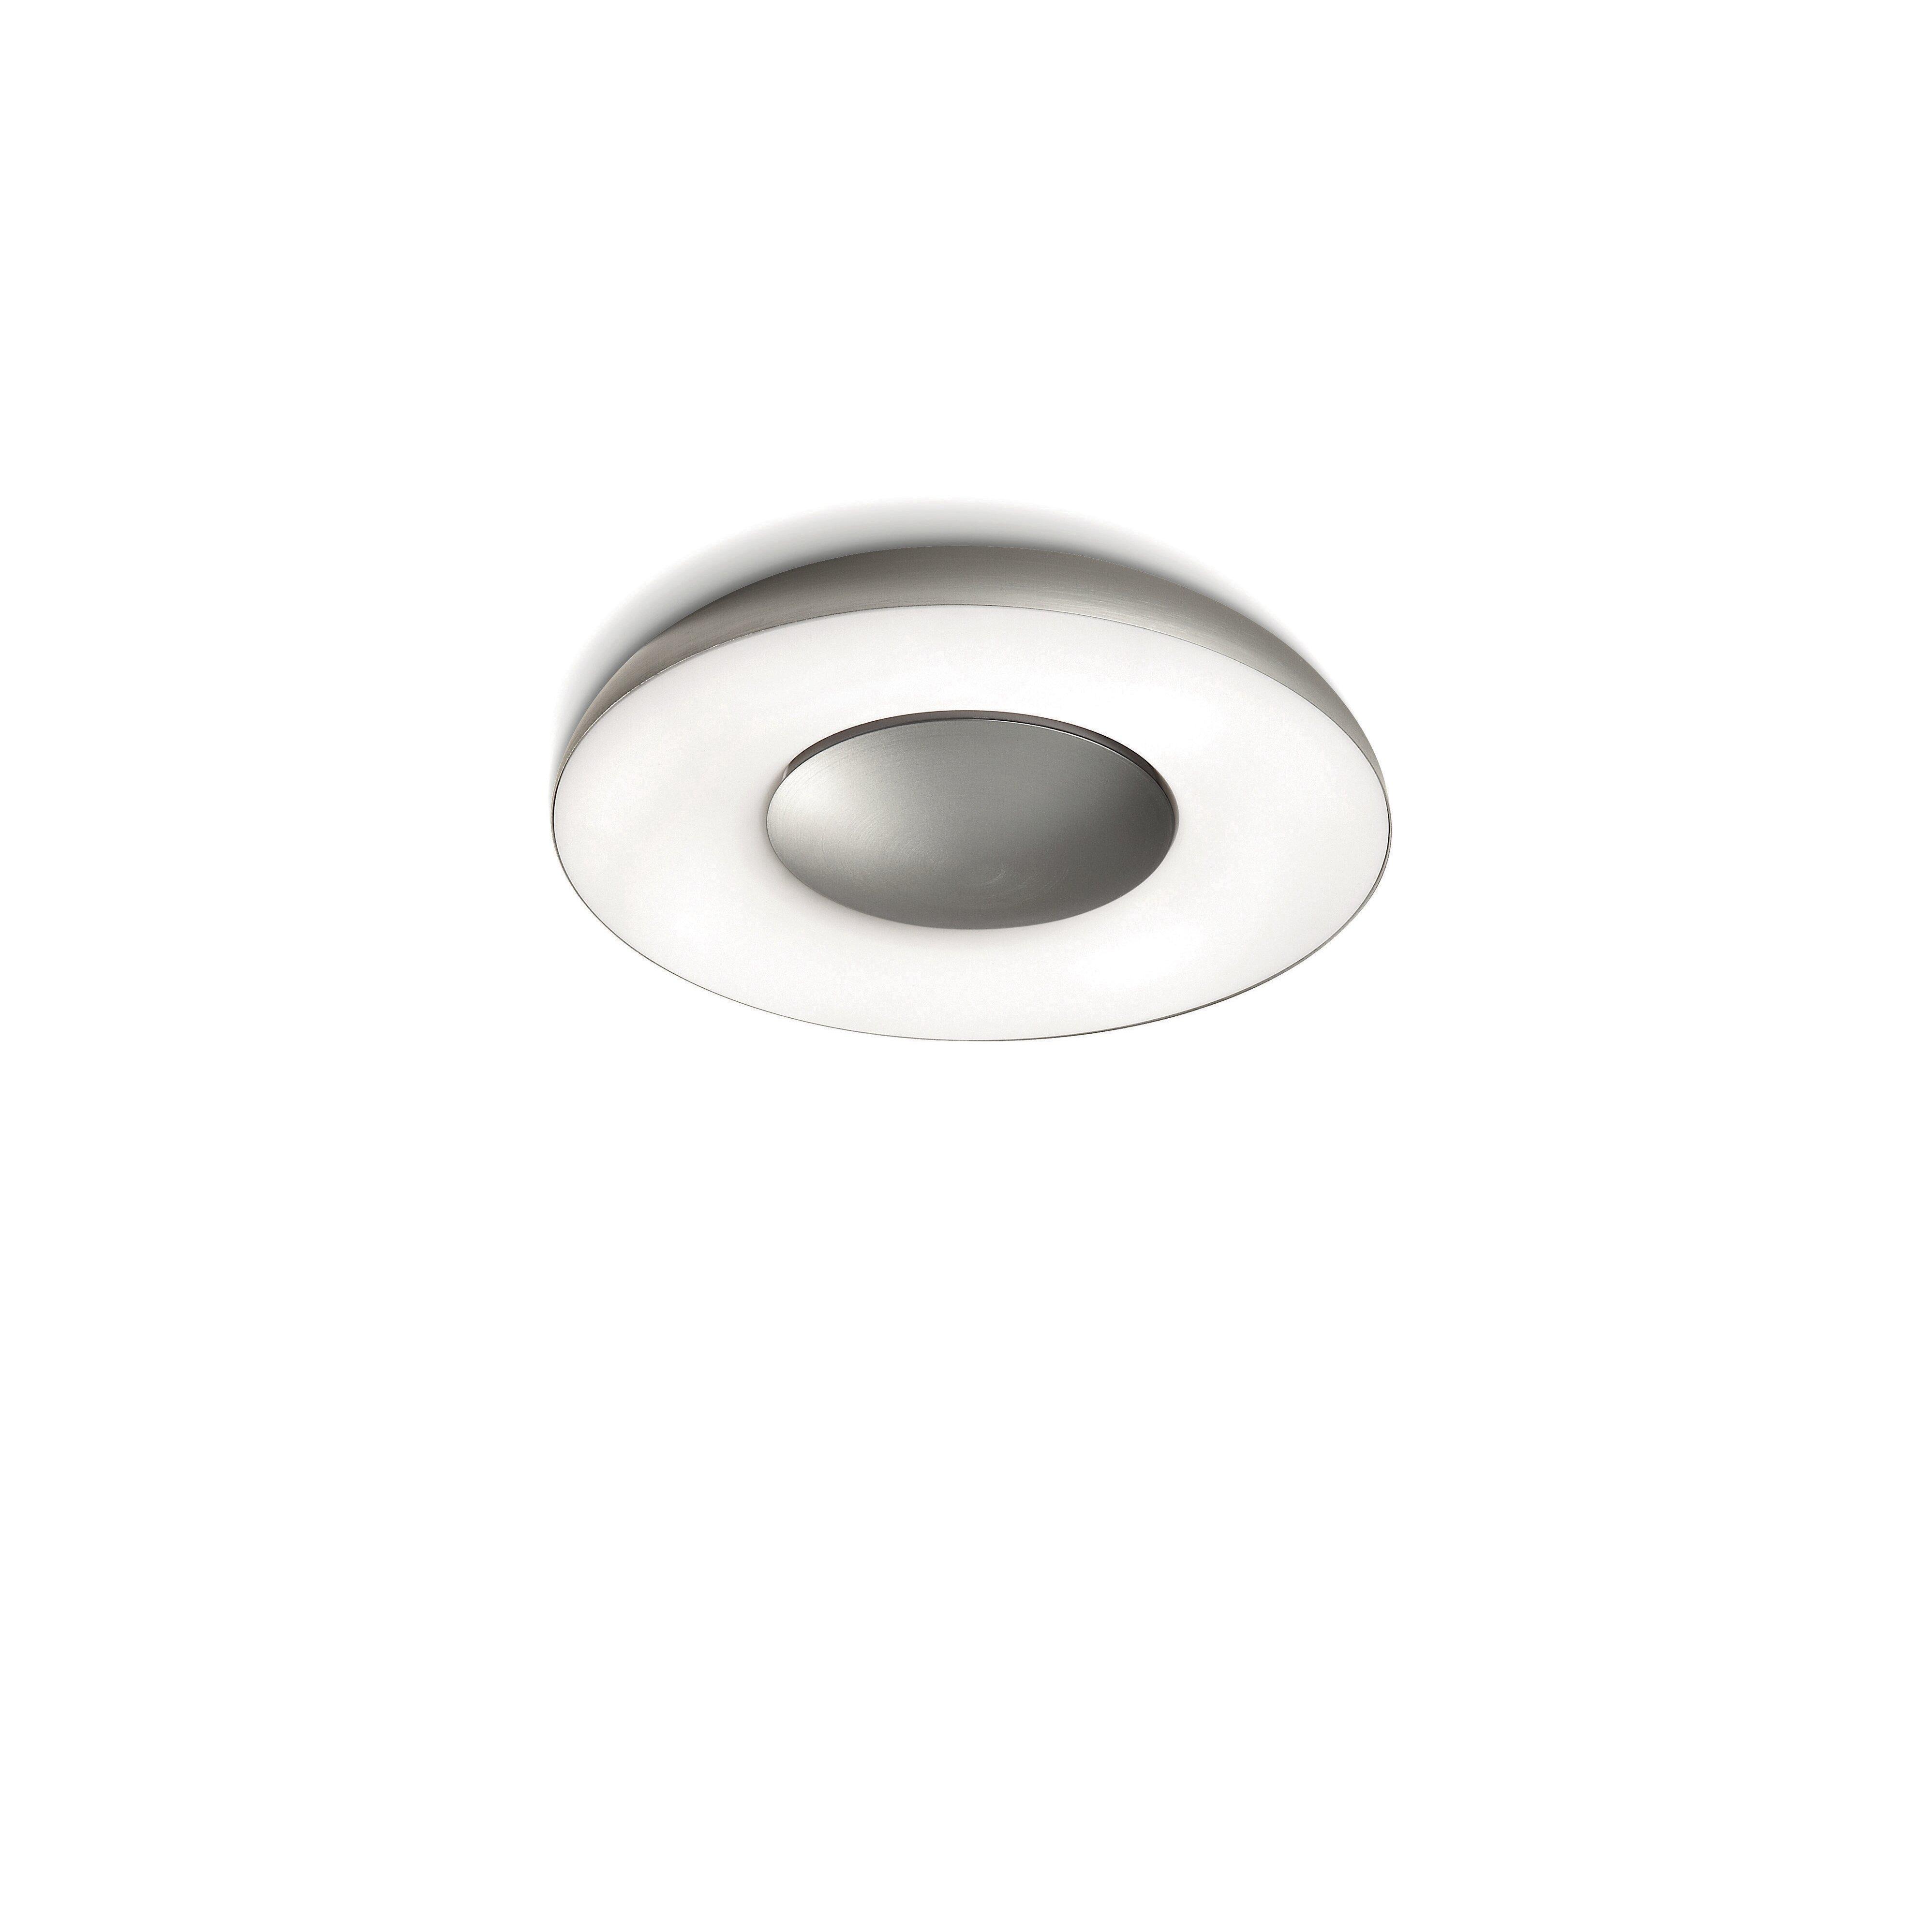 philips consumer luminaire element 1 light wall sconce allmodern. Black Bedroom Furniture Sets. Home Design Ideas